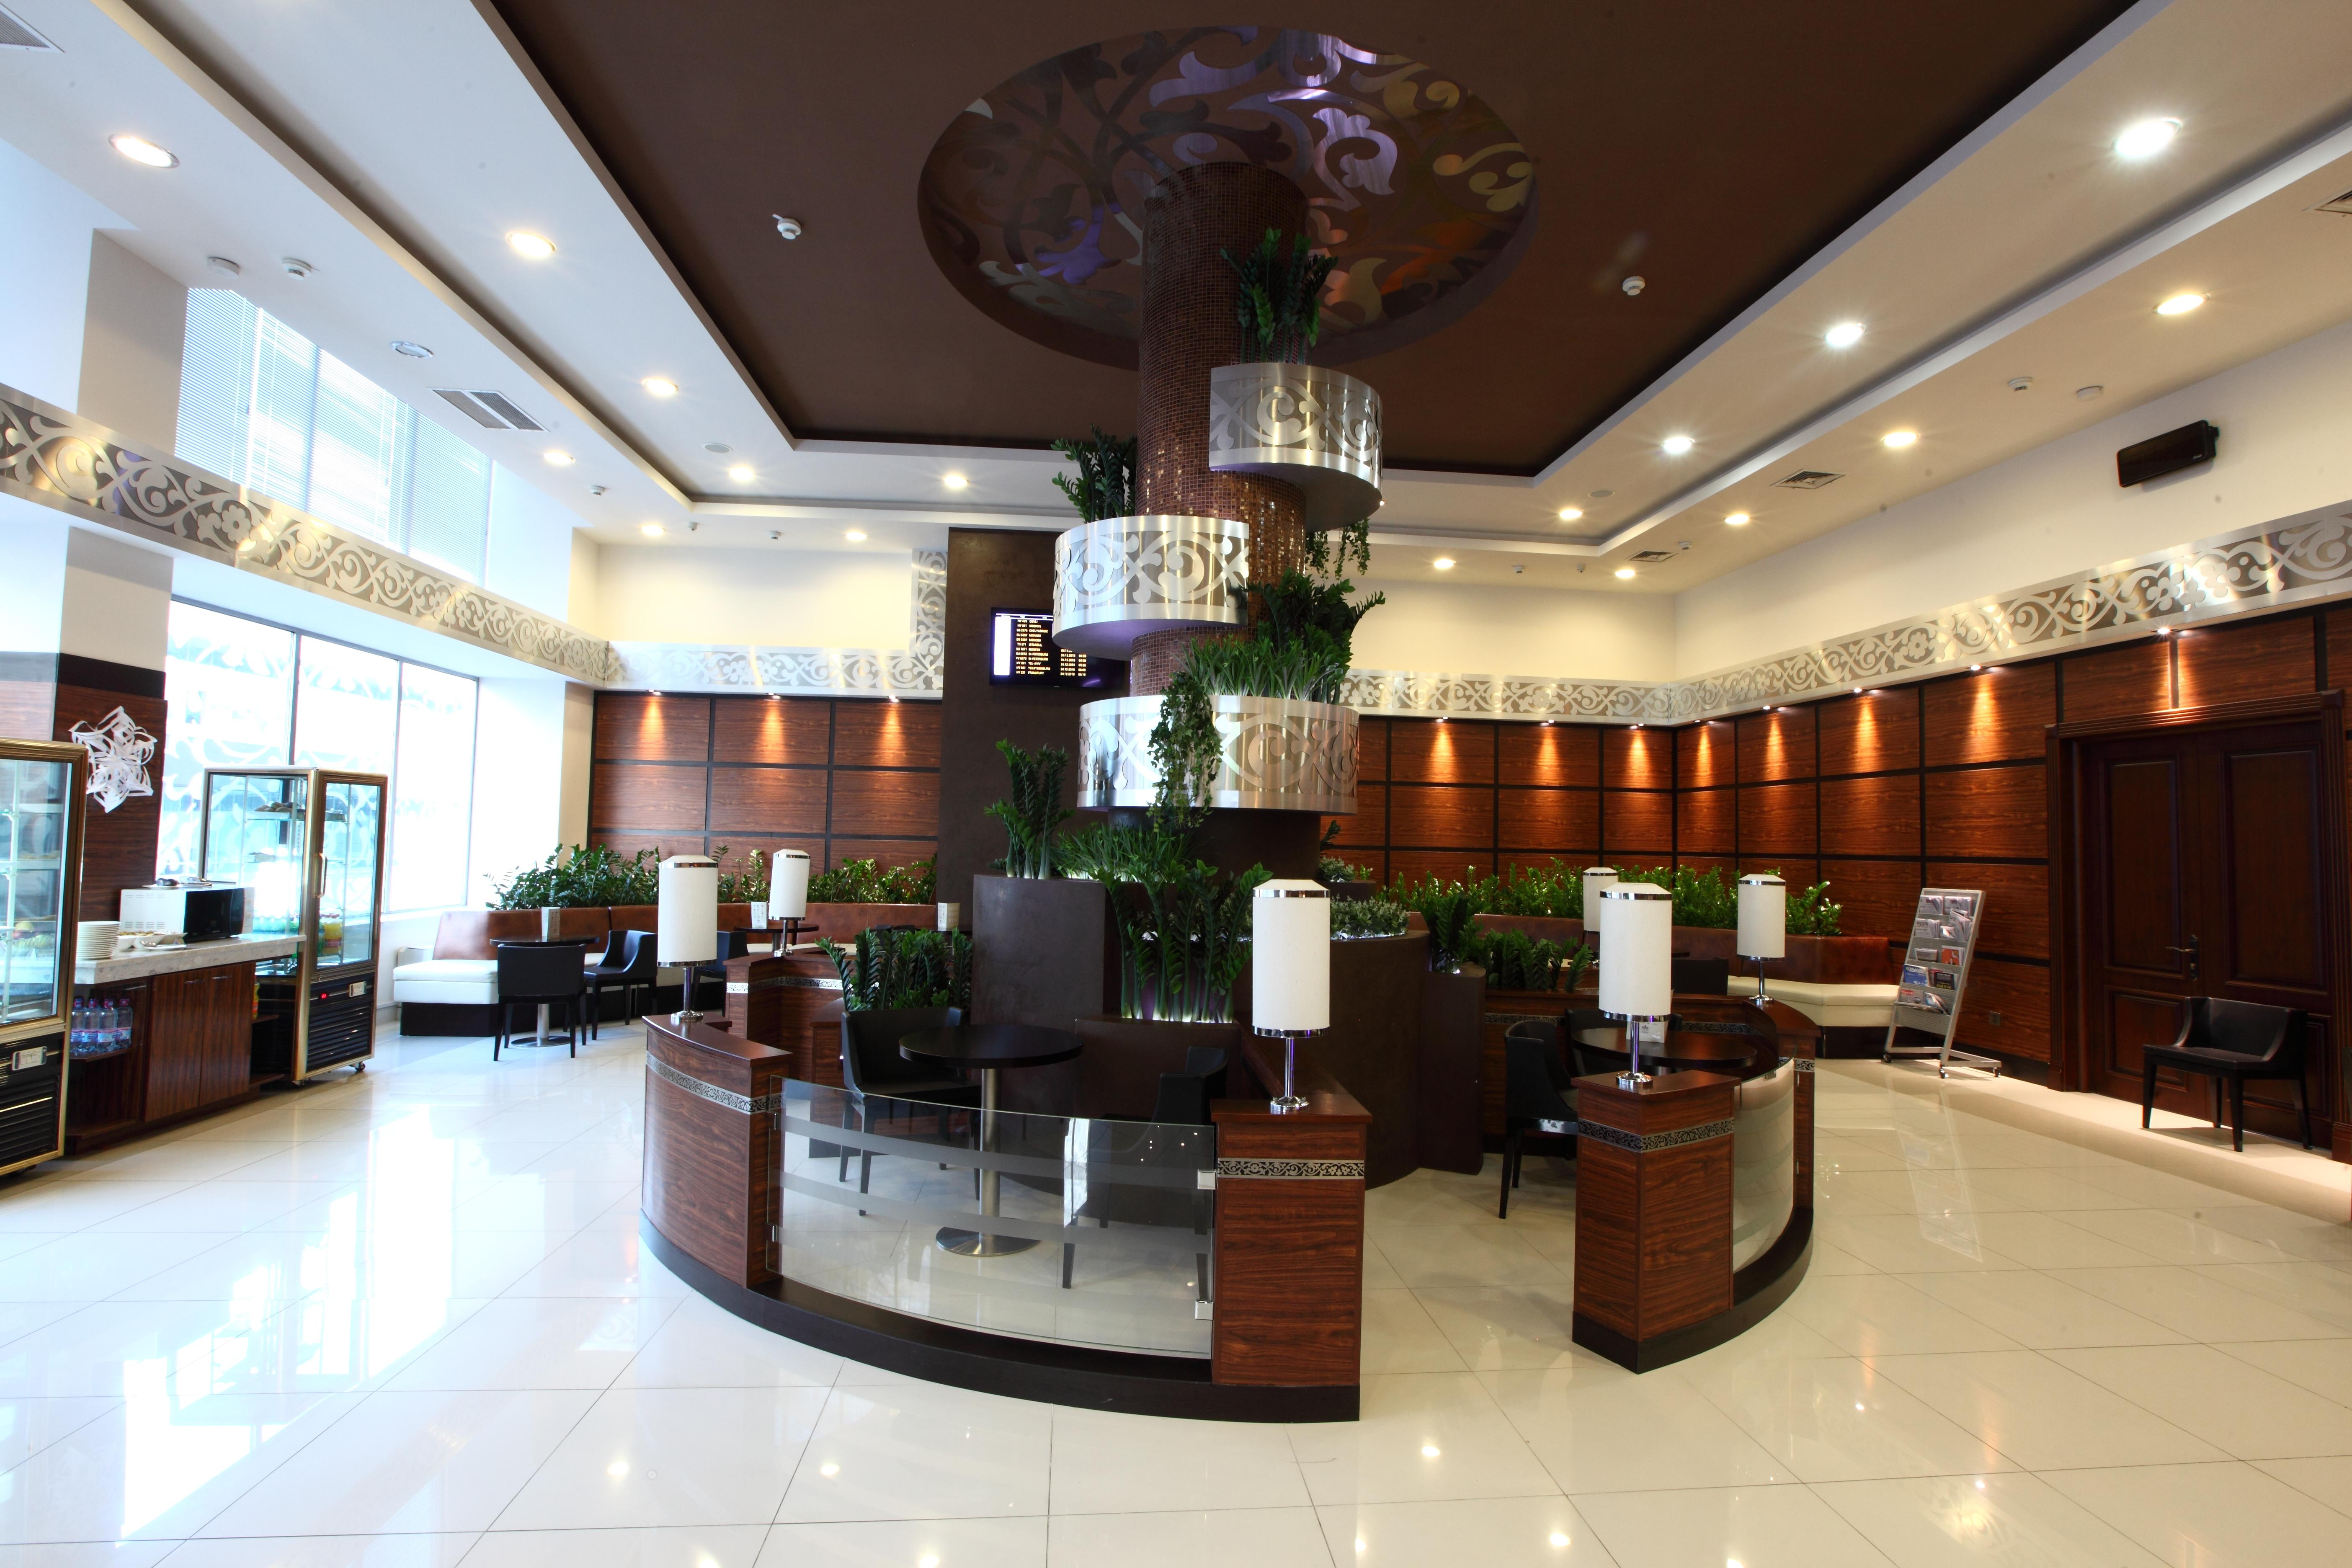 CIP hall of Tashkent airport